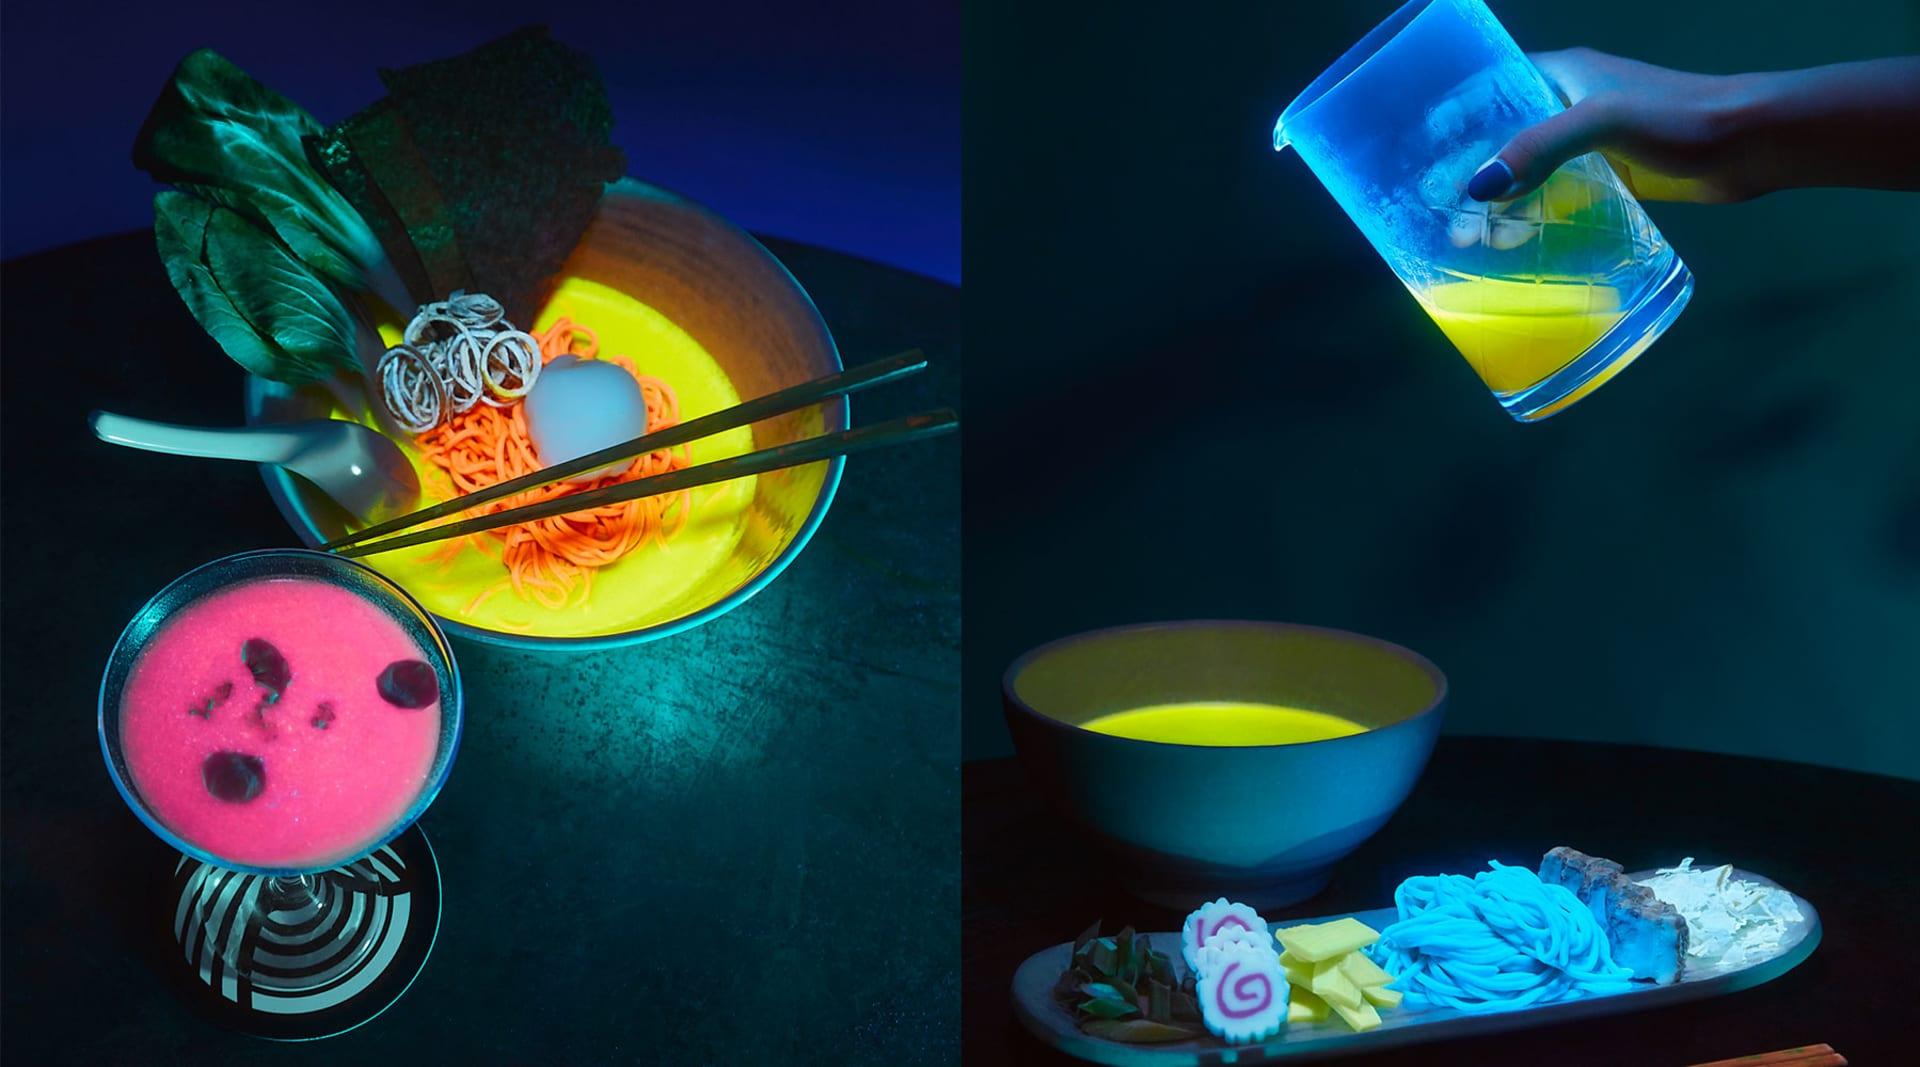 HERO glow in the dark ramen roundup